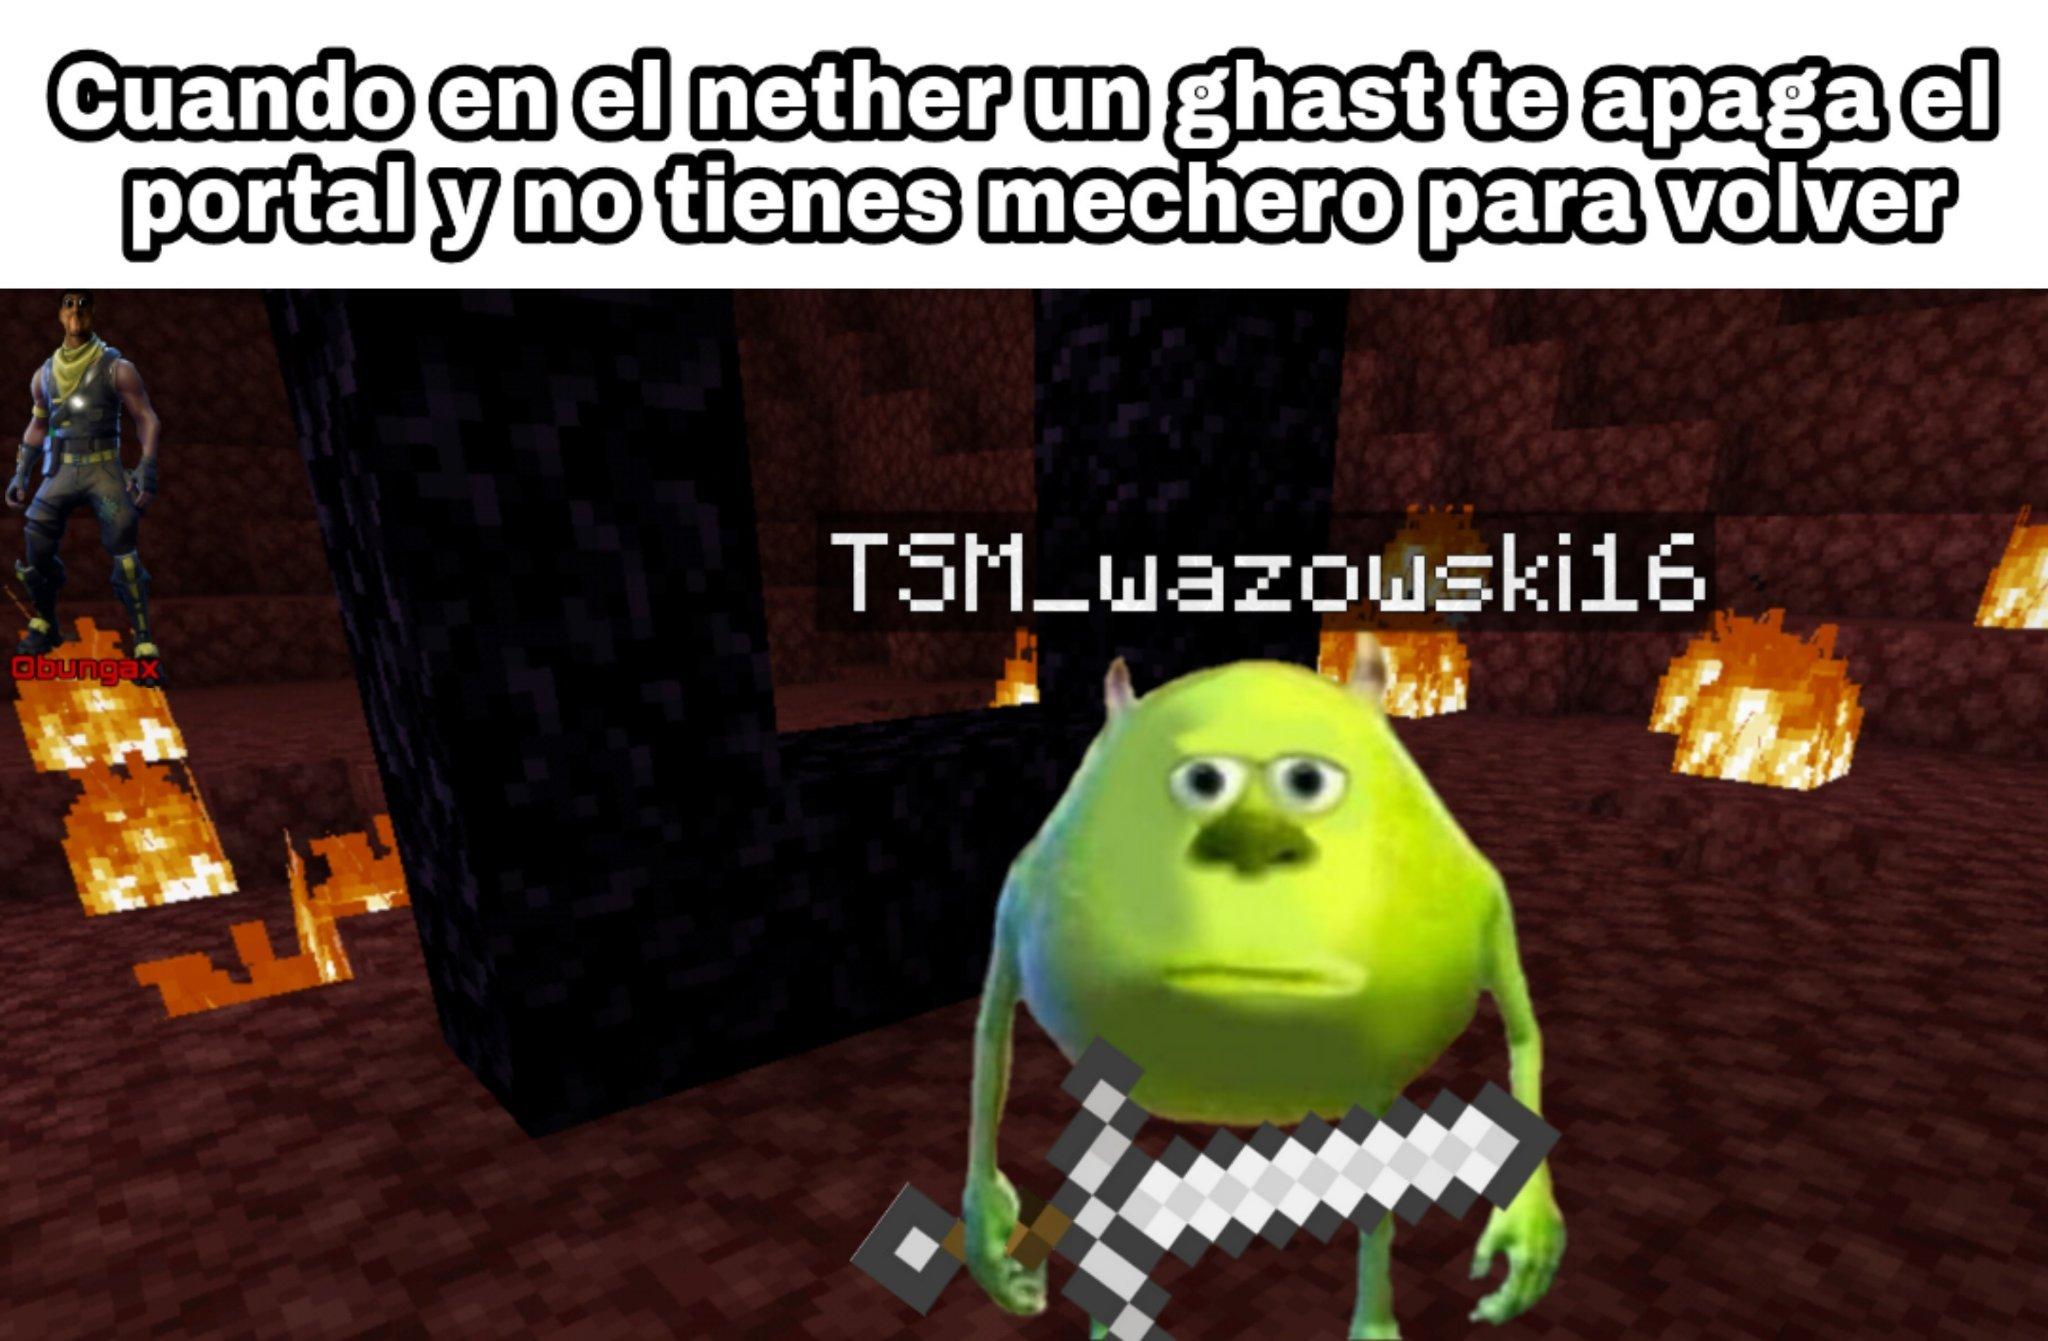 49 - meme